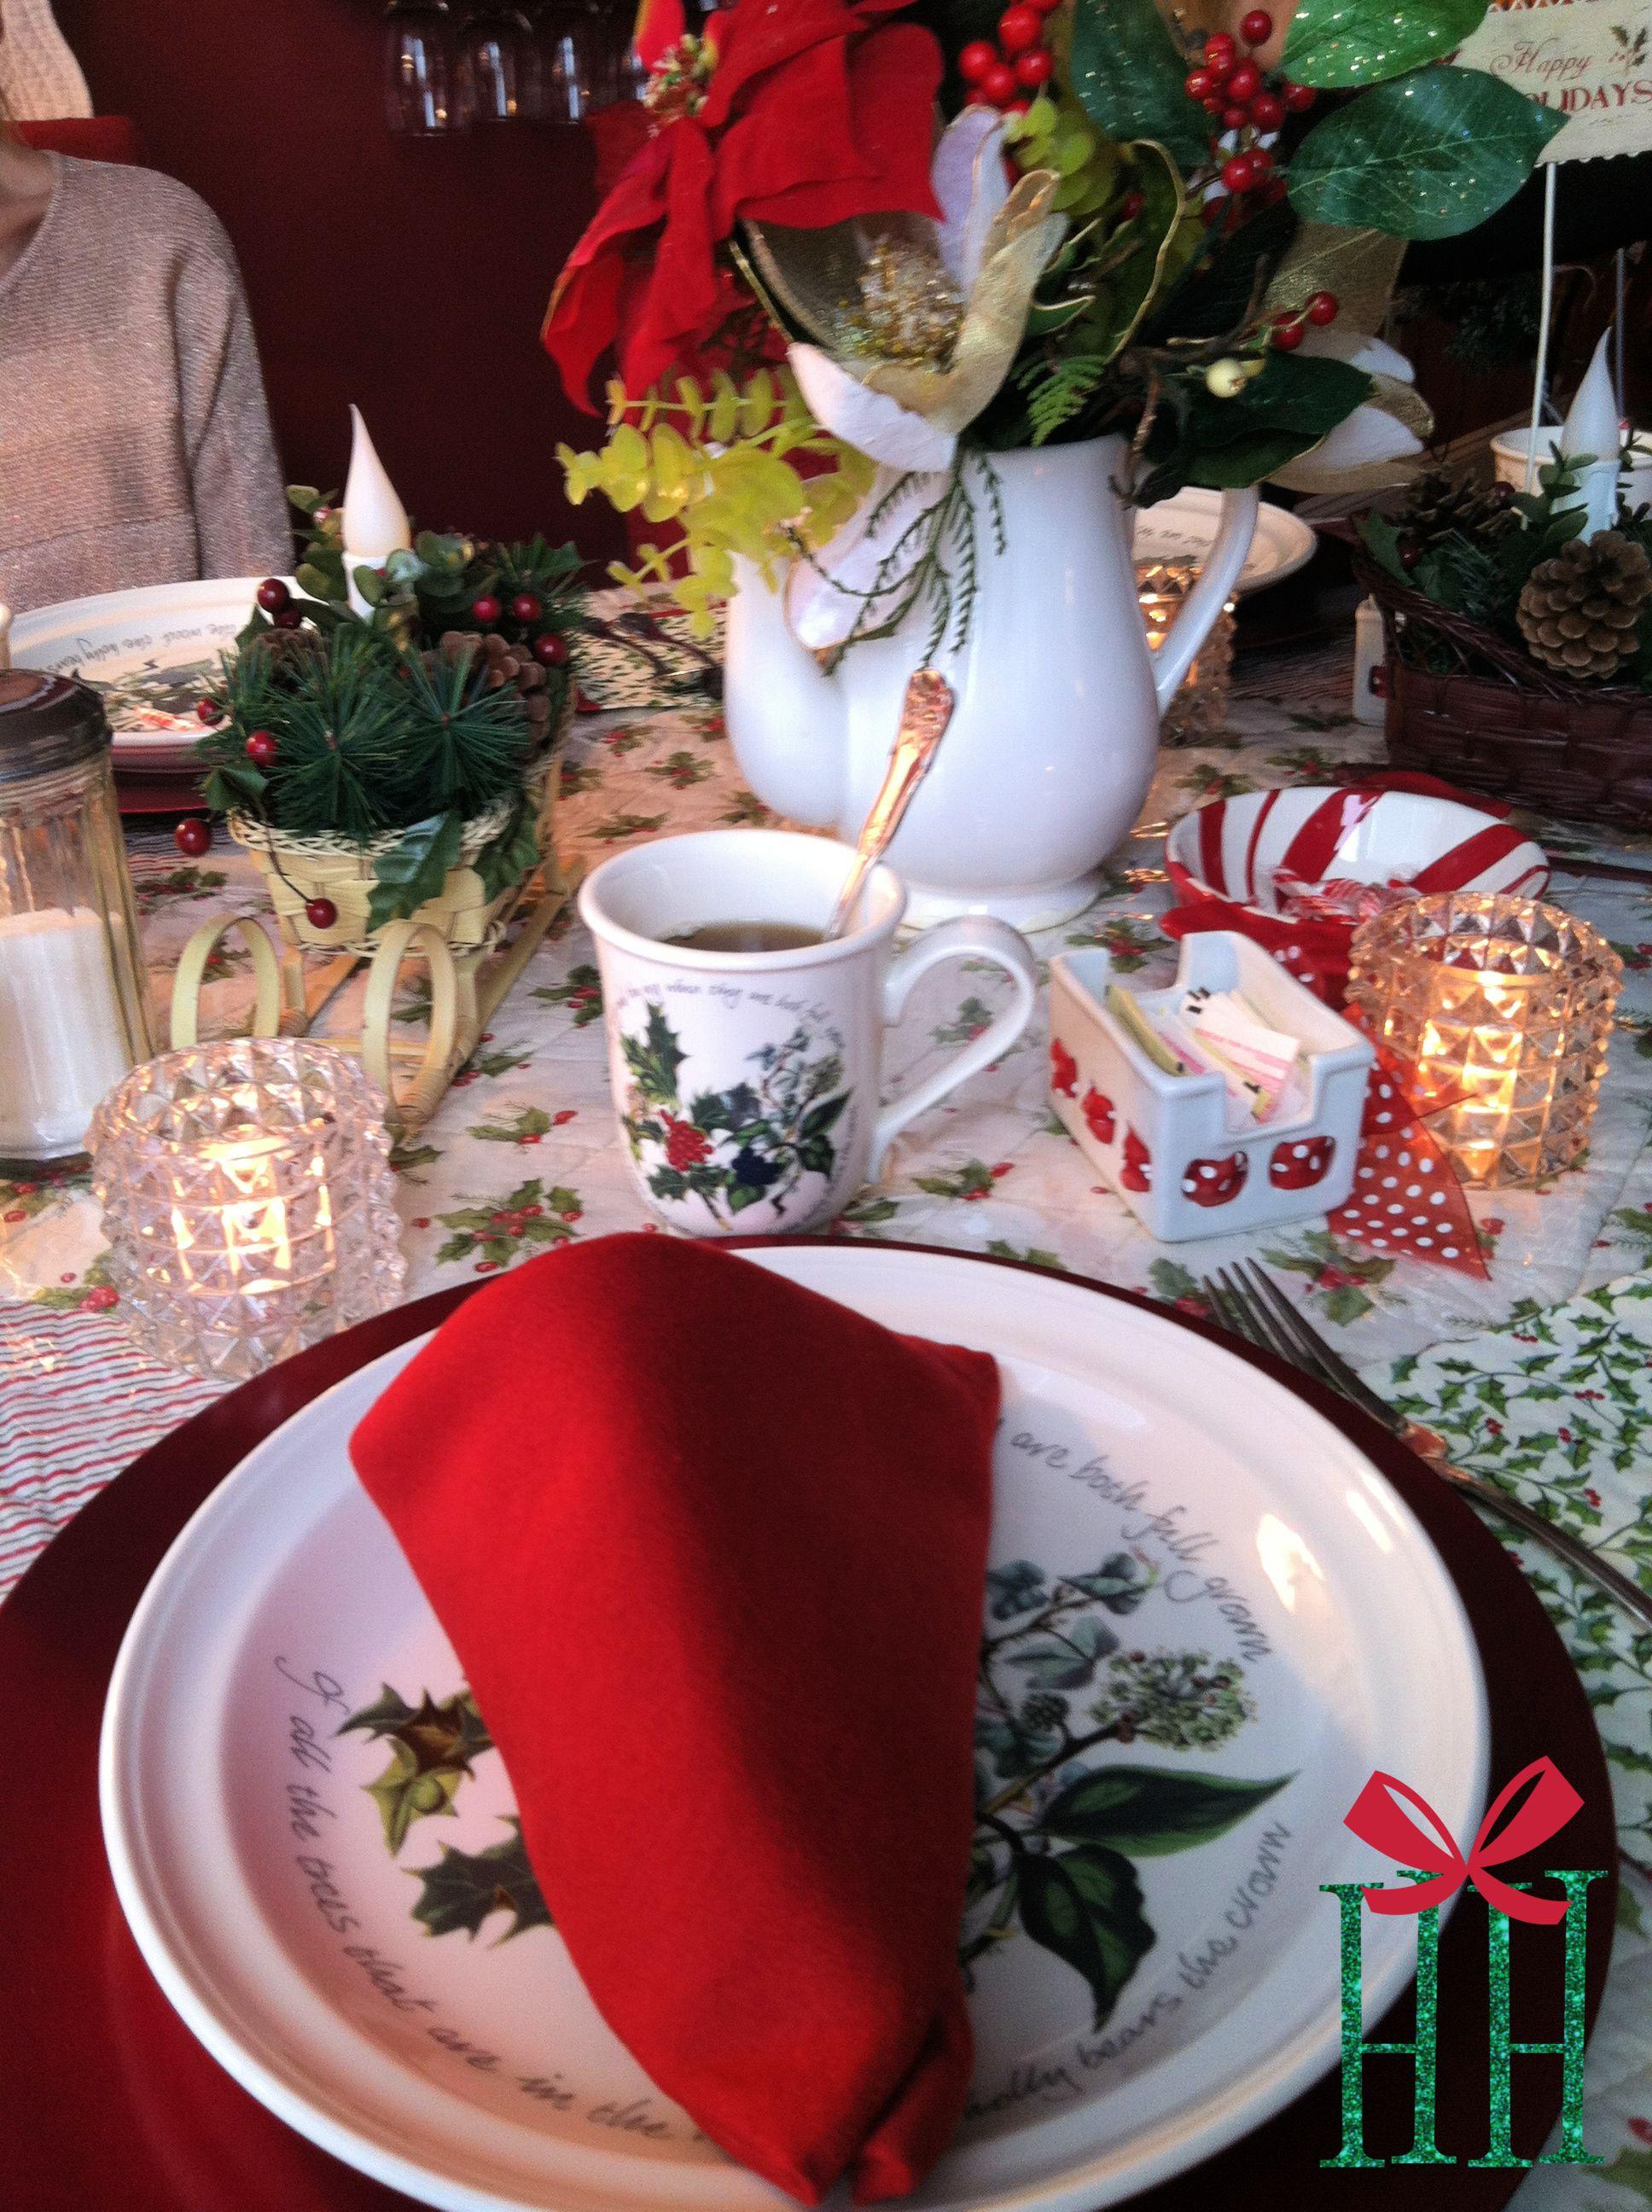 Christmas Memories in 2020 Christmas table settings